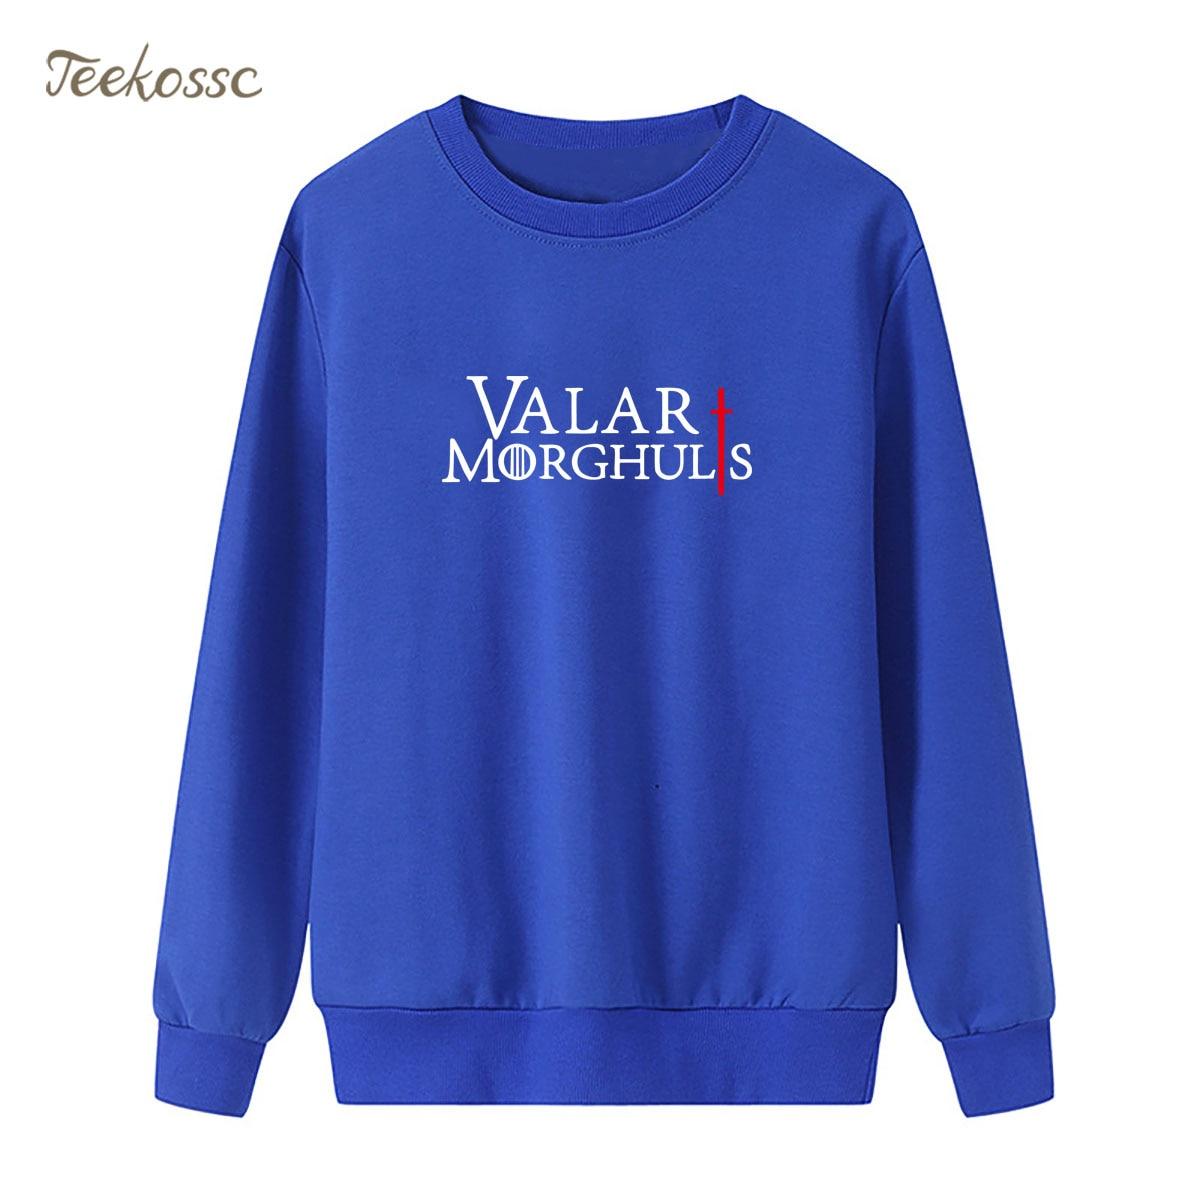 Game Of Thrones Sweatshirts Womens Valar Morghulis Khalessi Hoodies Winter Autumn Lady Pullover Fleece Warm Caual Sportswear